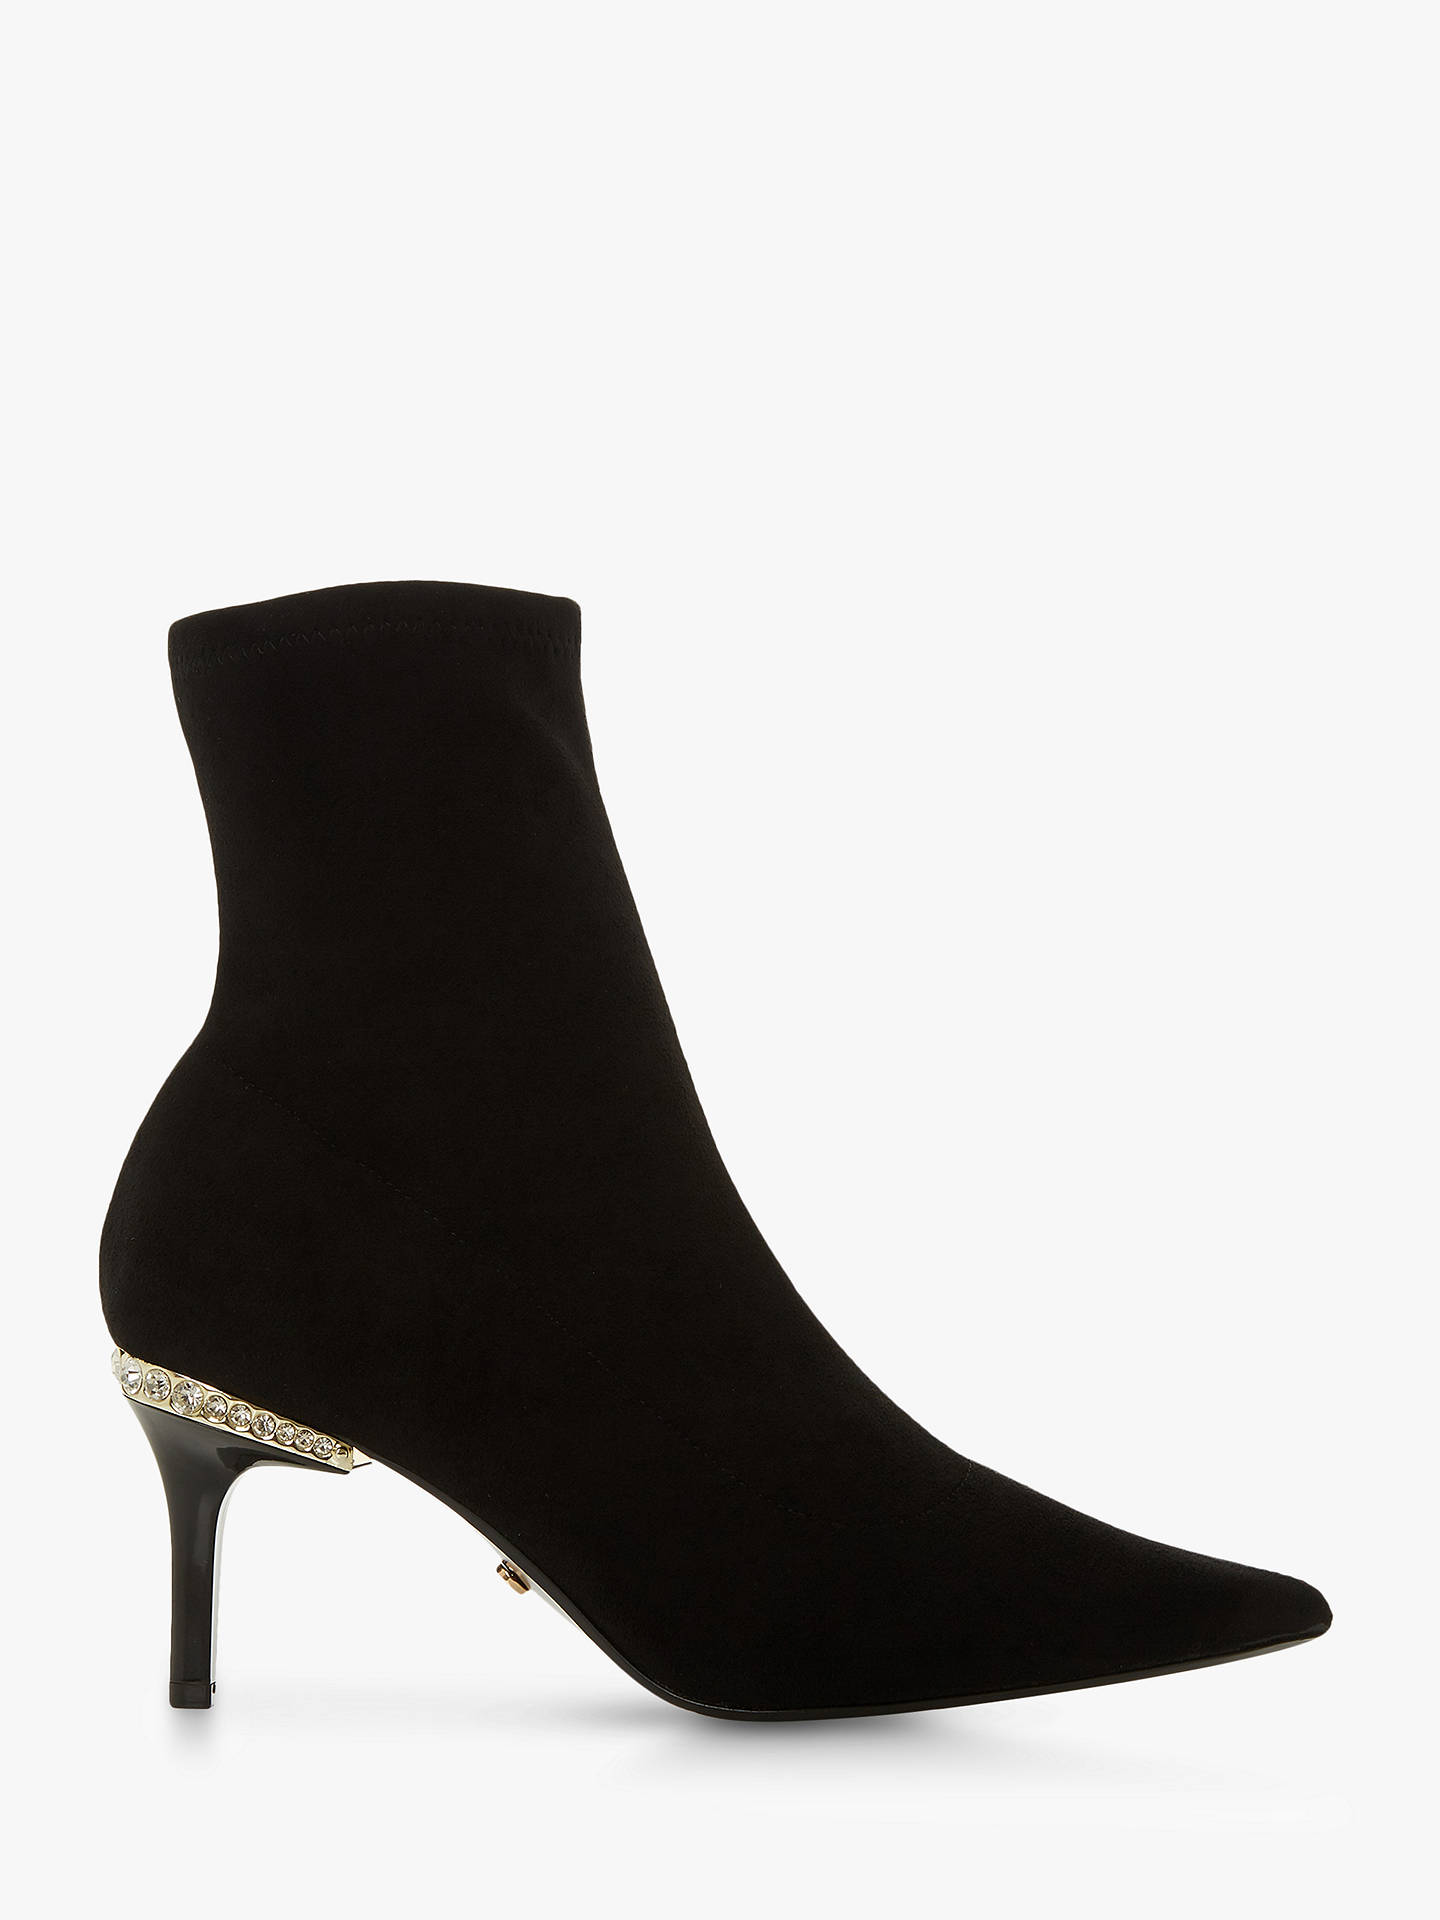 8fcdb6cc71 Buy Dune Olantis Stone Embellished Kitten Heel Boots, Black, 3 Online at  johnlewis.